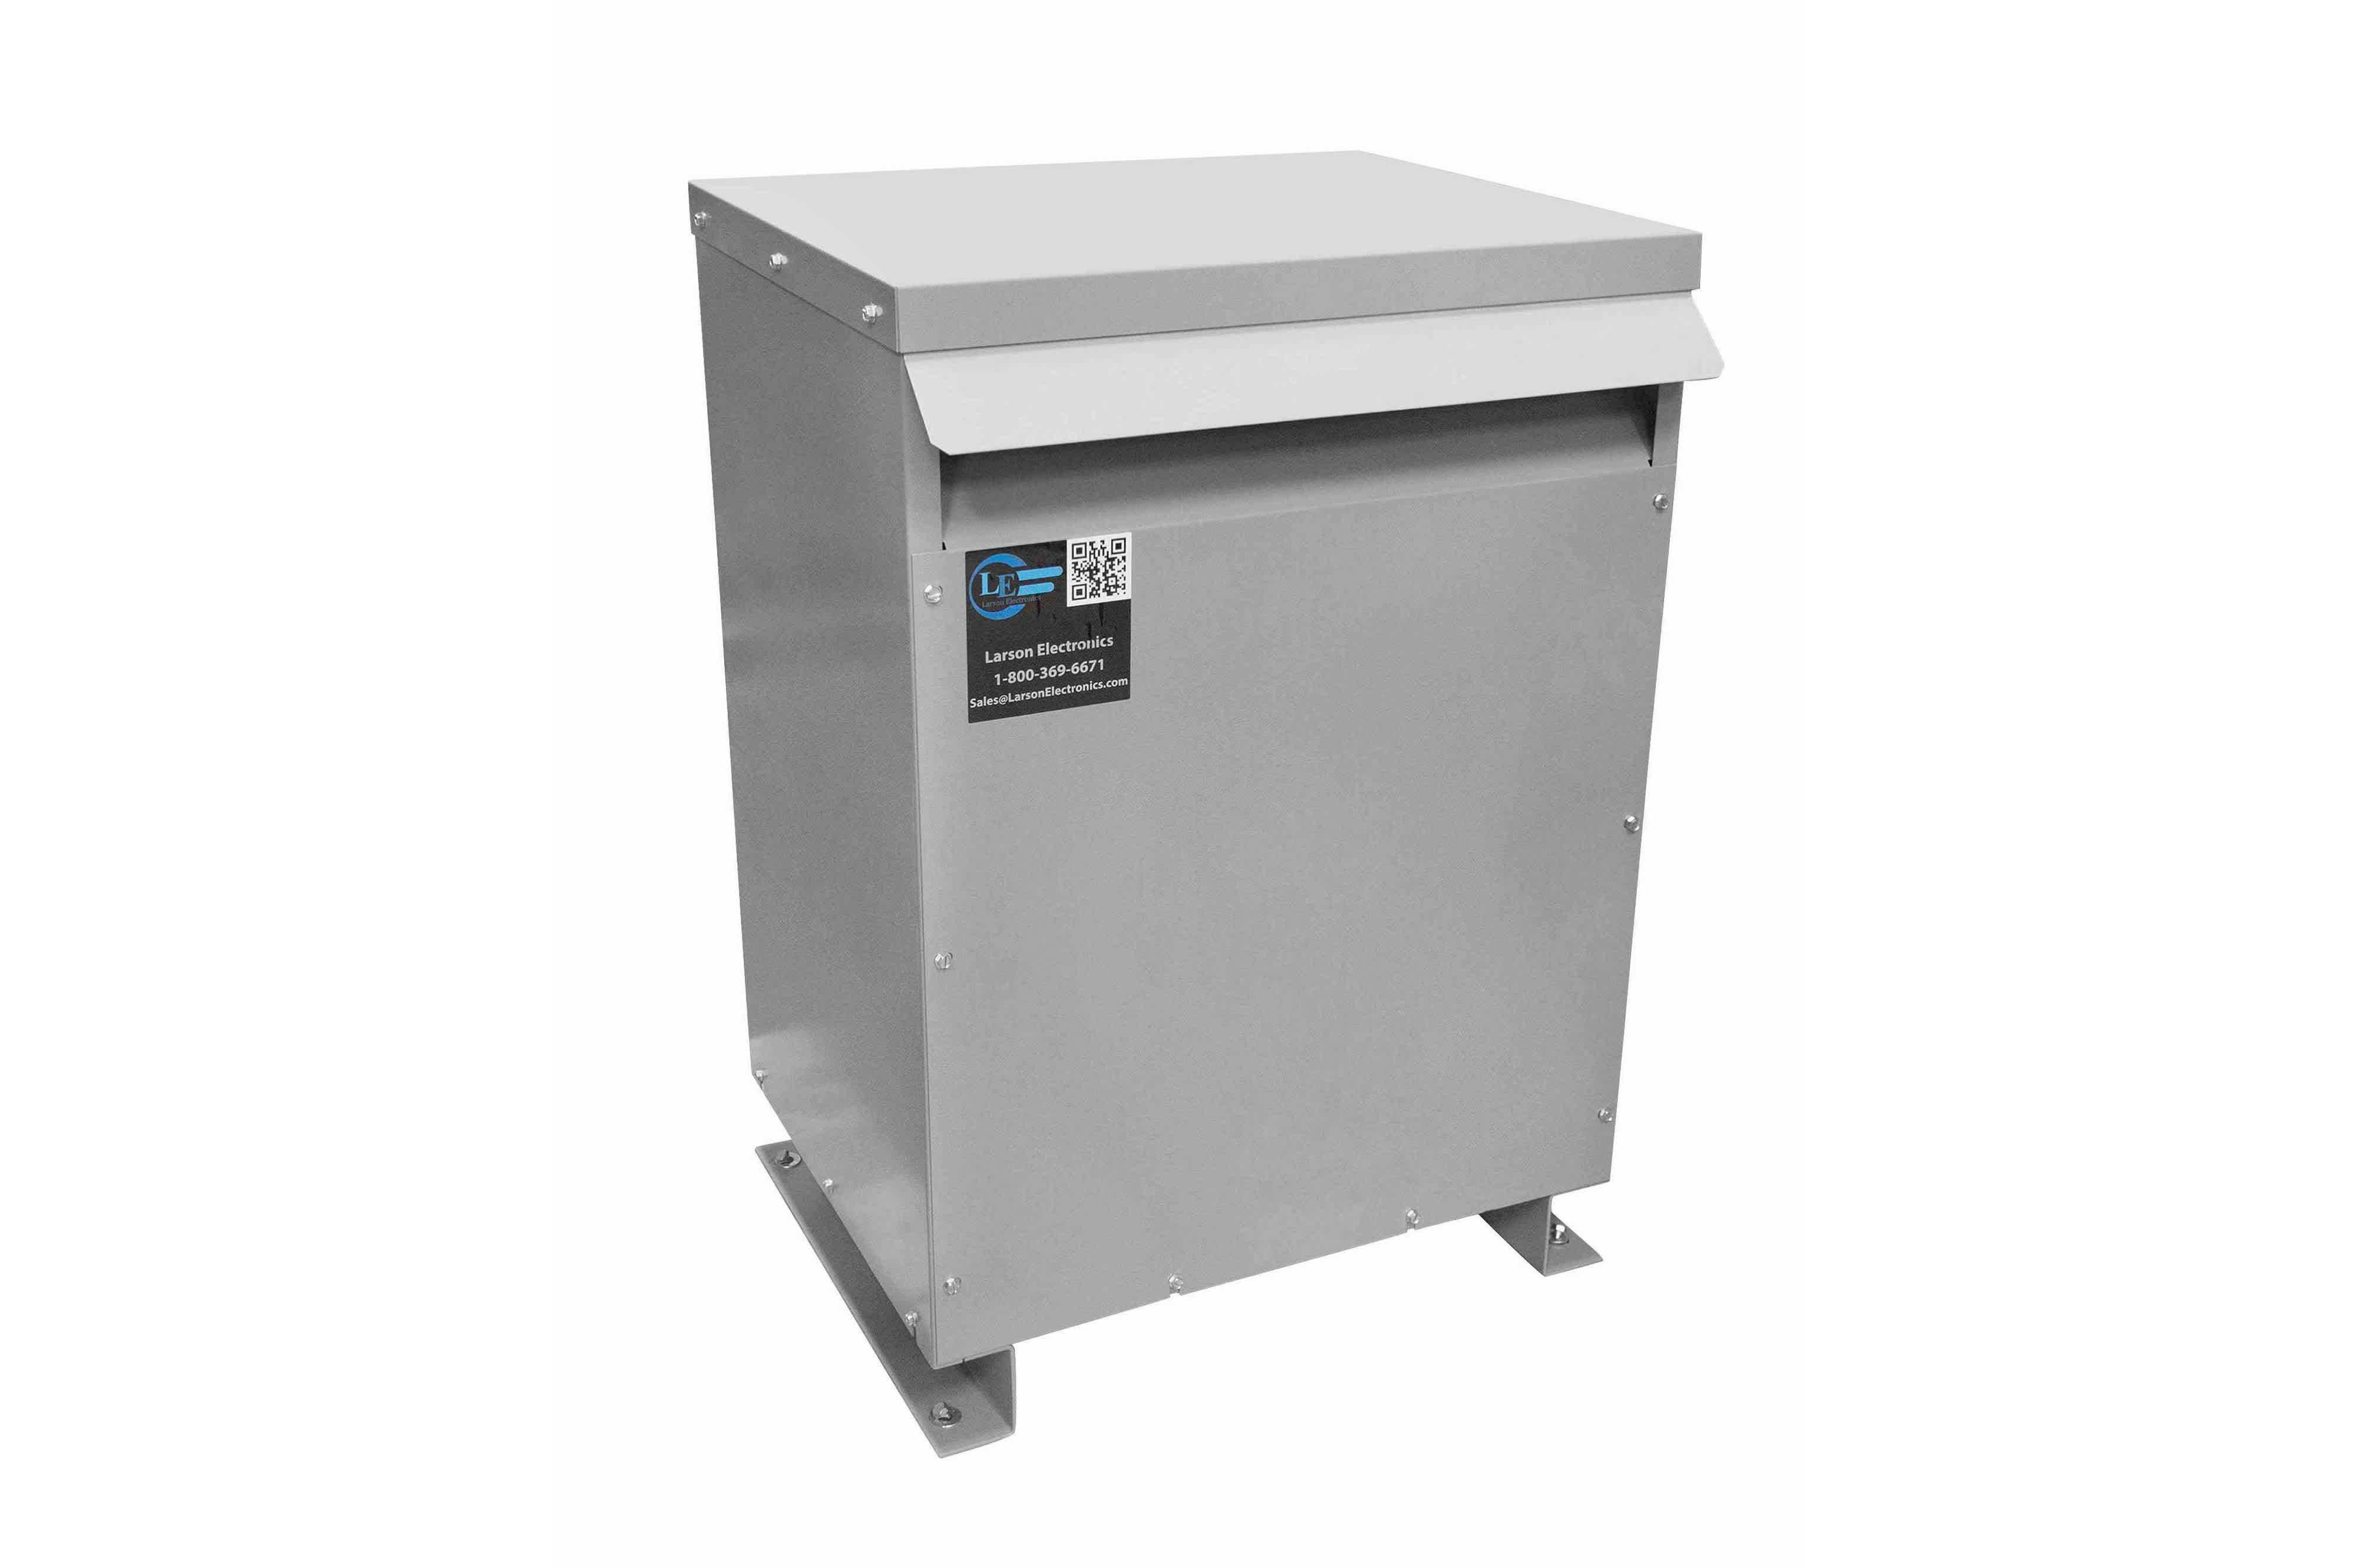 600 kVA 3PH Isolation Transformer, 575V Wye Primary, 208Y/120 Wye-N Secondary, N3R, Ventilated, 60 Hz